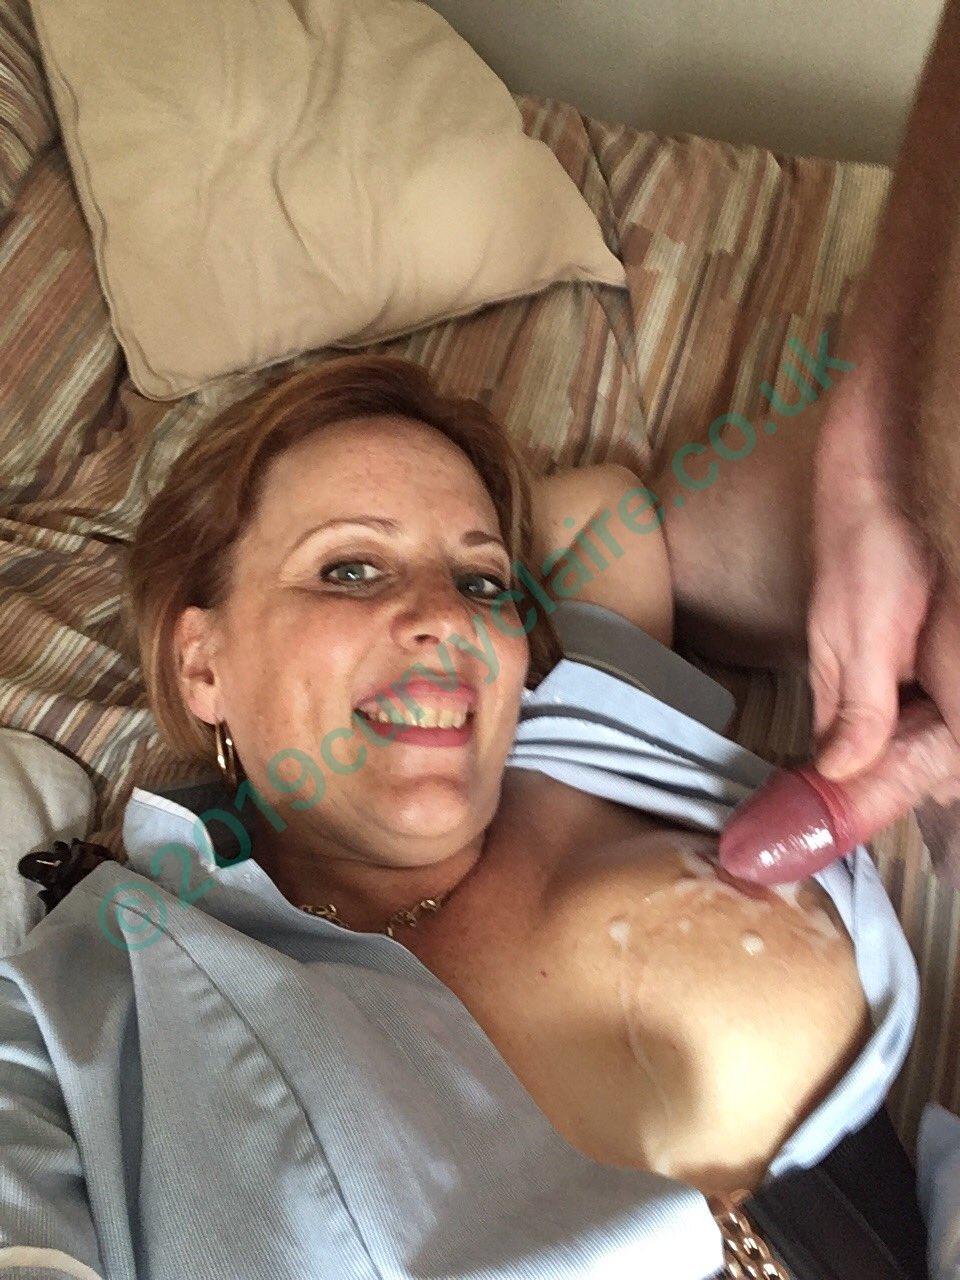 erotica movie porn